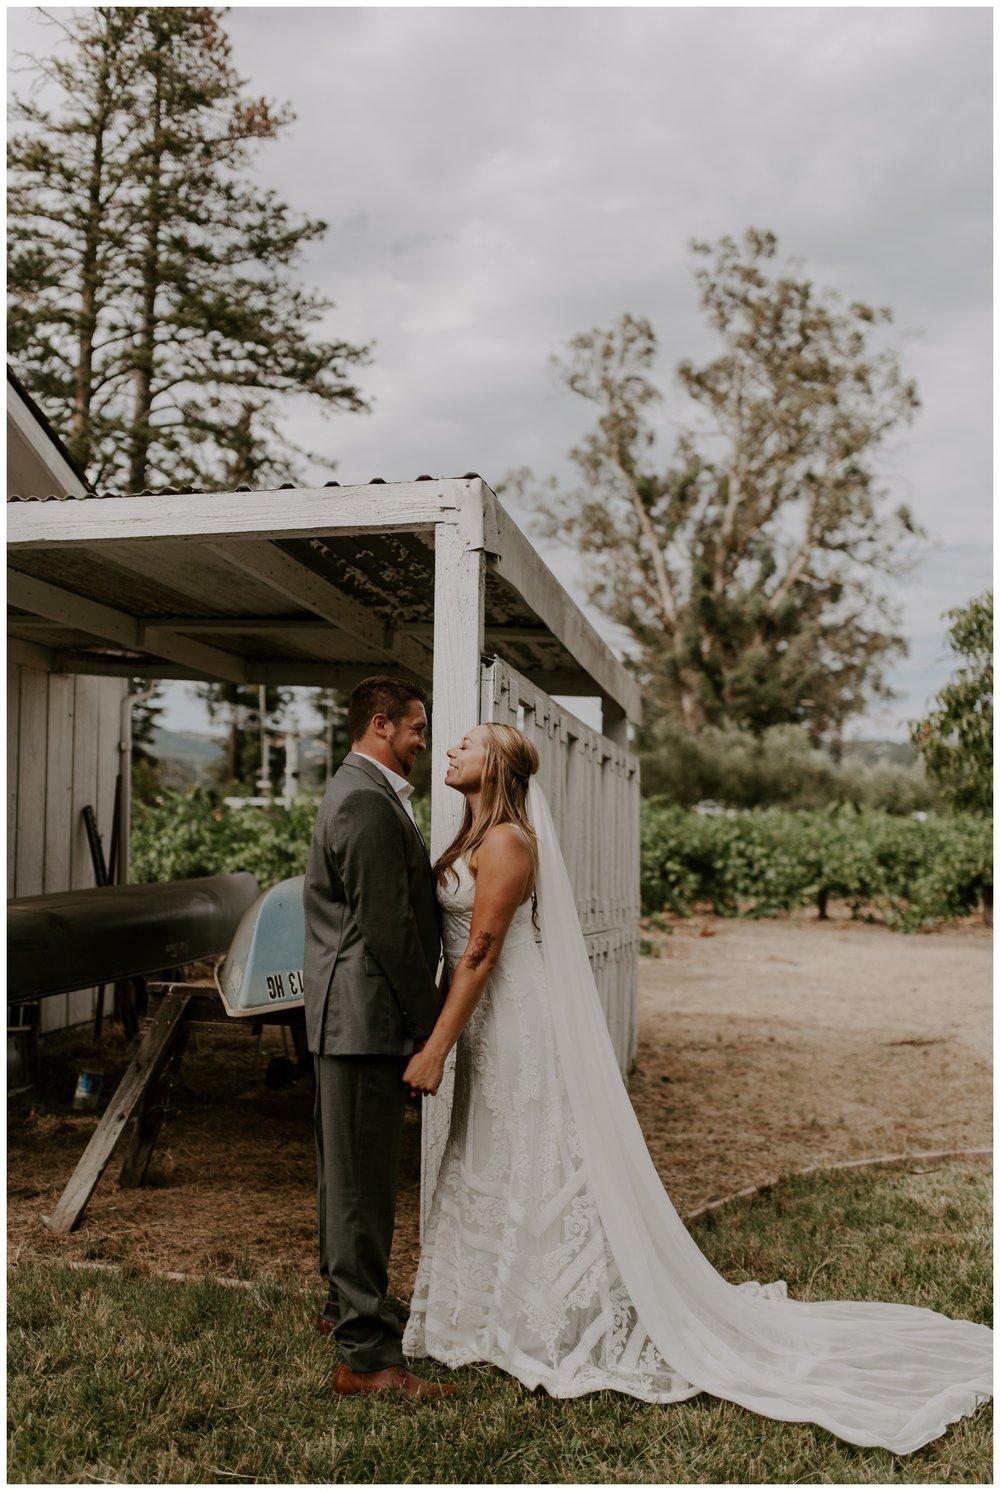 Napa Valley Backyard Wedding and Reception at Elizabeth Spencer Winery | Jessica Heron Images 106.jpg